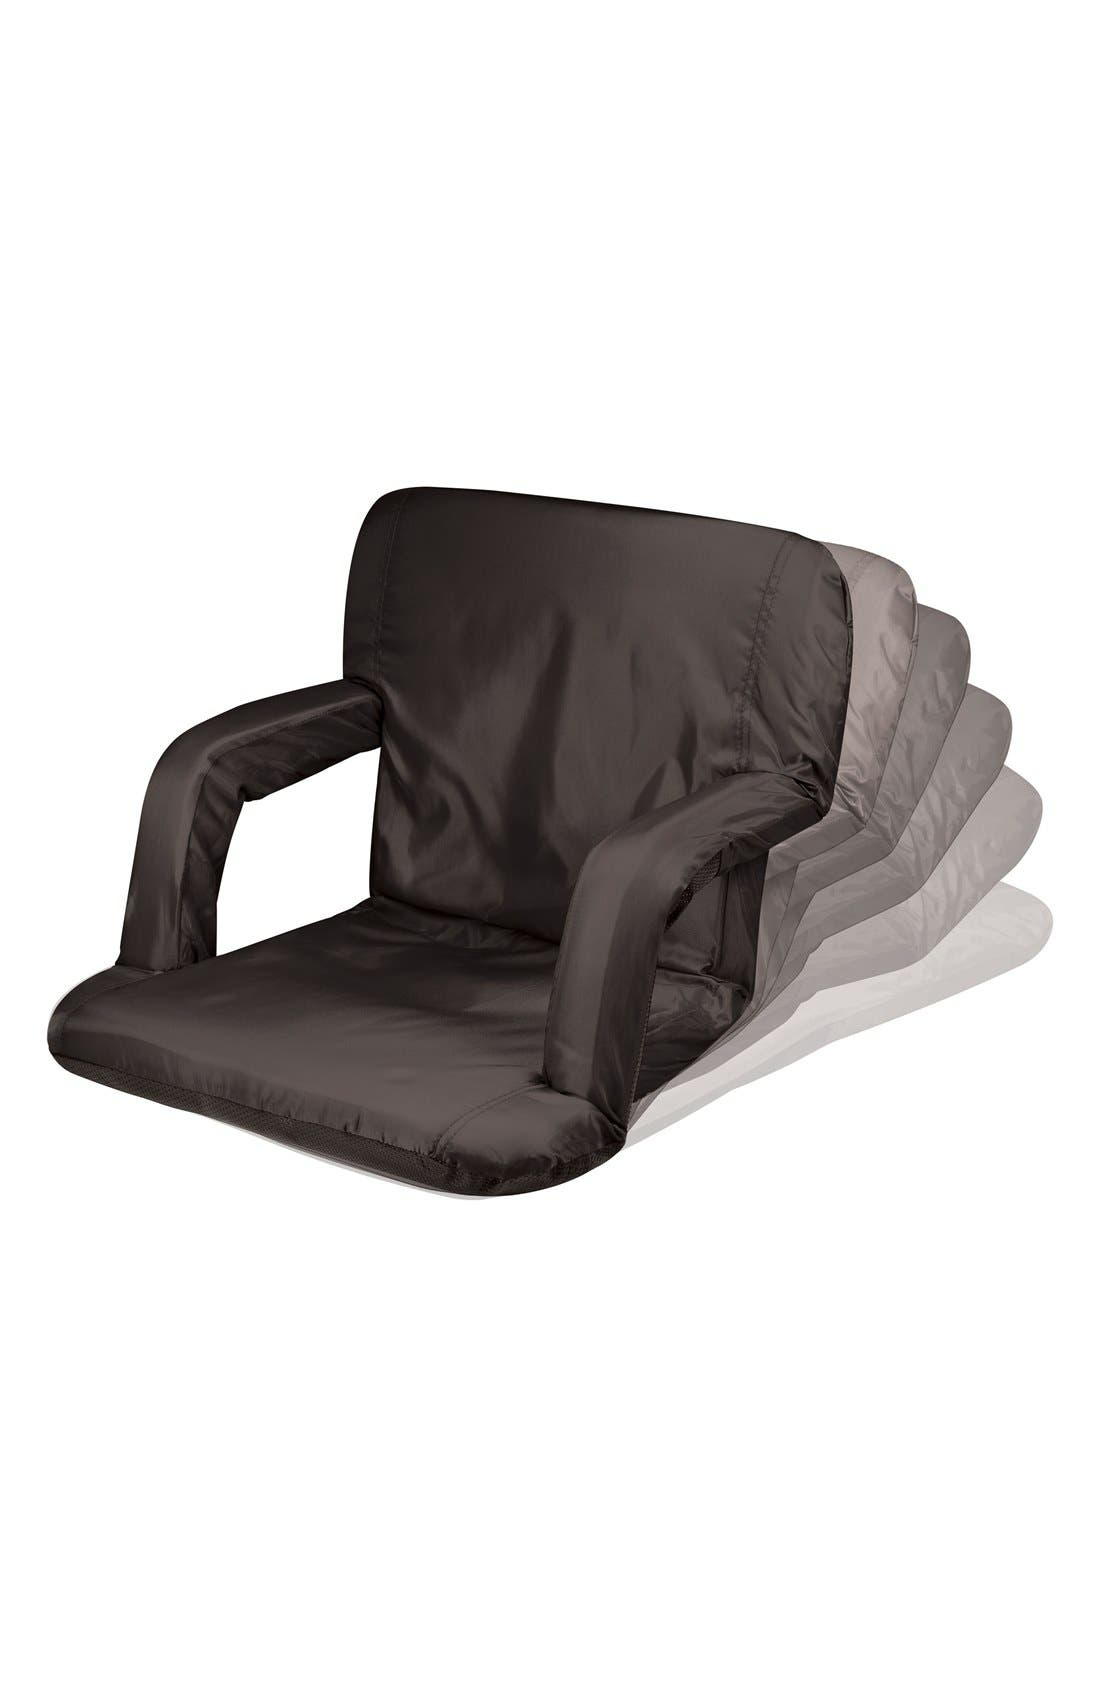 'VenturaSeat' Portable Fold-Up Chair,                             Alternate thumbnail 3, color,                             BLACK